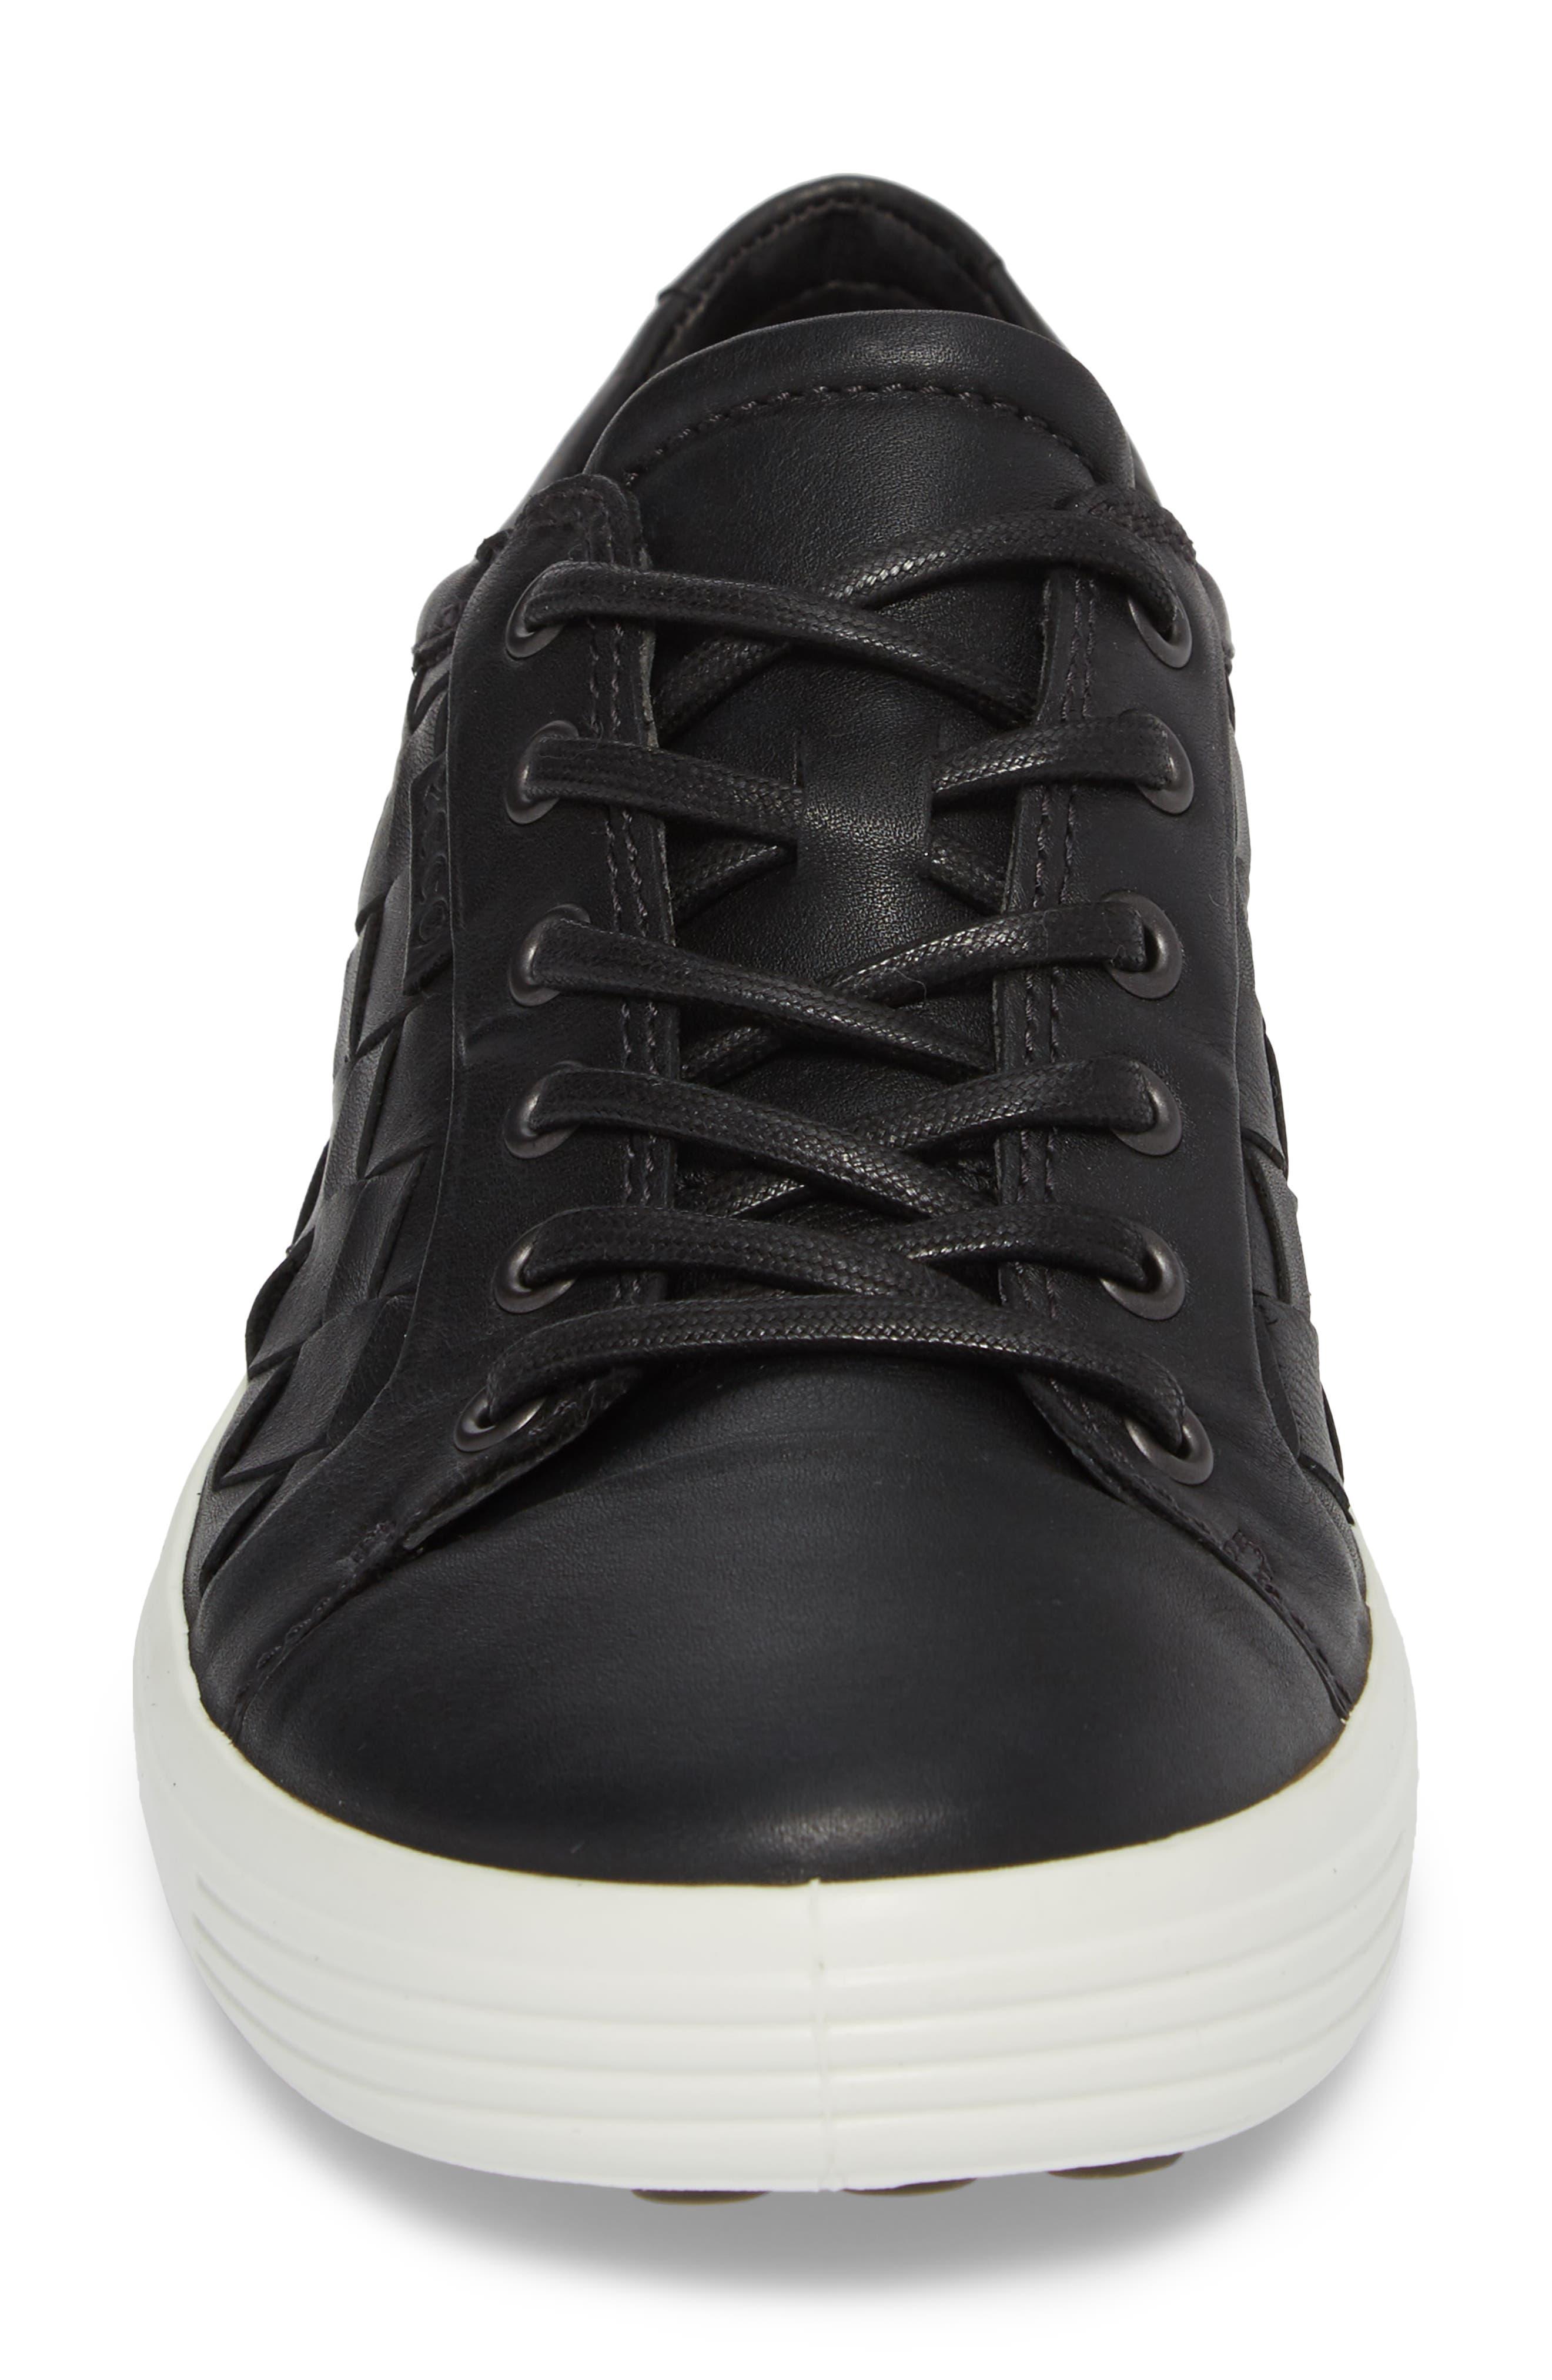 ECCO, Soft 7 Woven Sneaker, Alternate thumbnail 4, color, 009